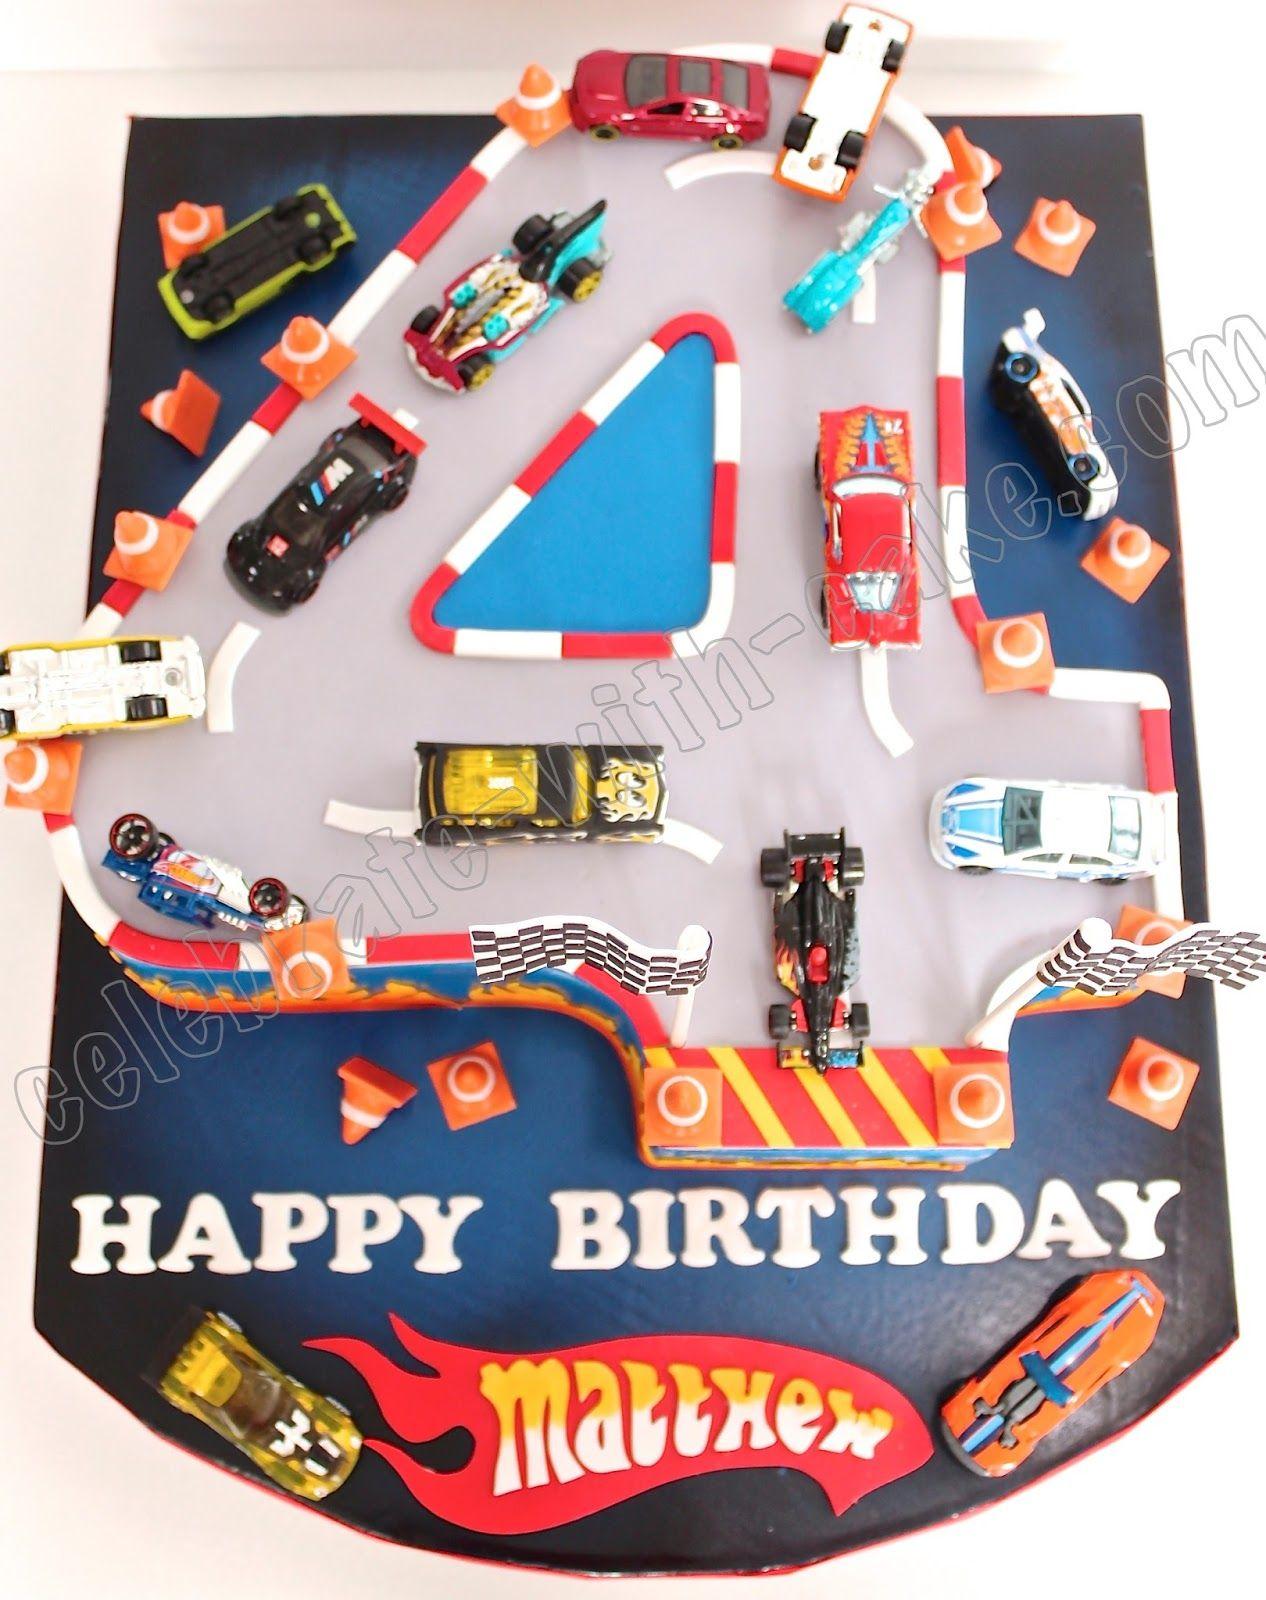 Sculpted Numeral Four Hotwheels Race Car Cake